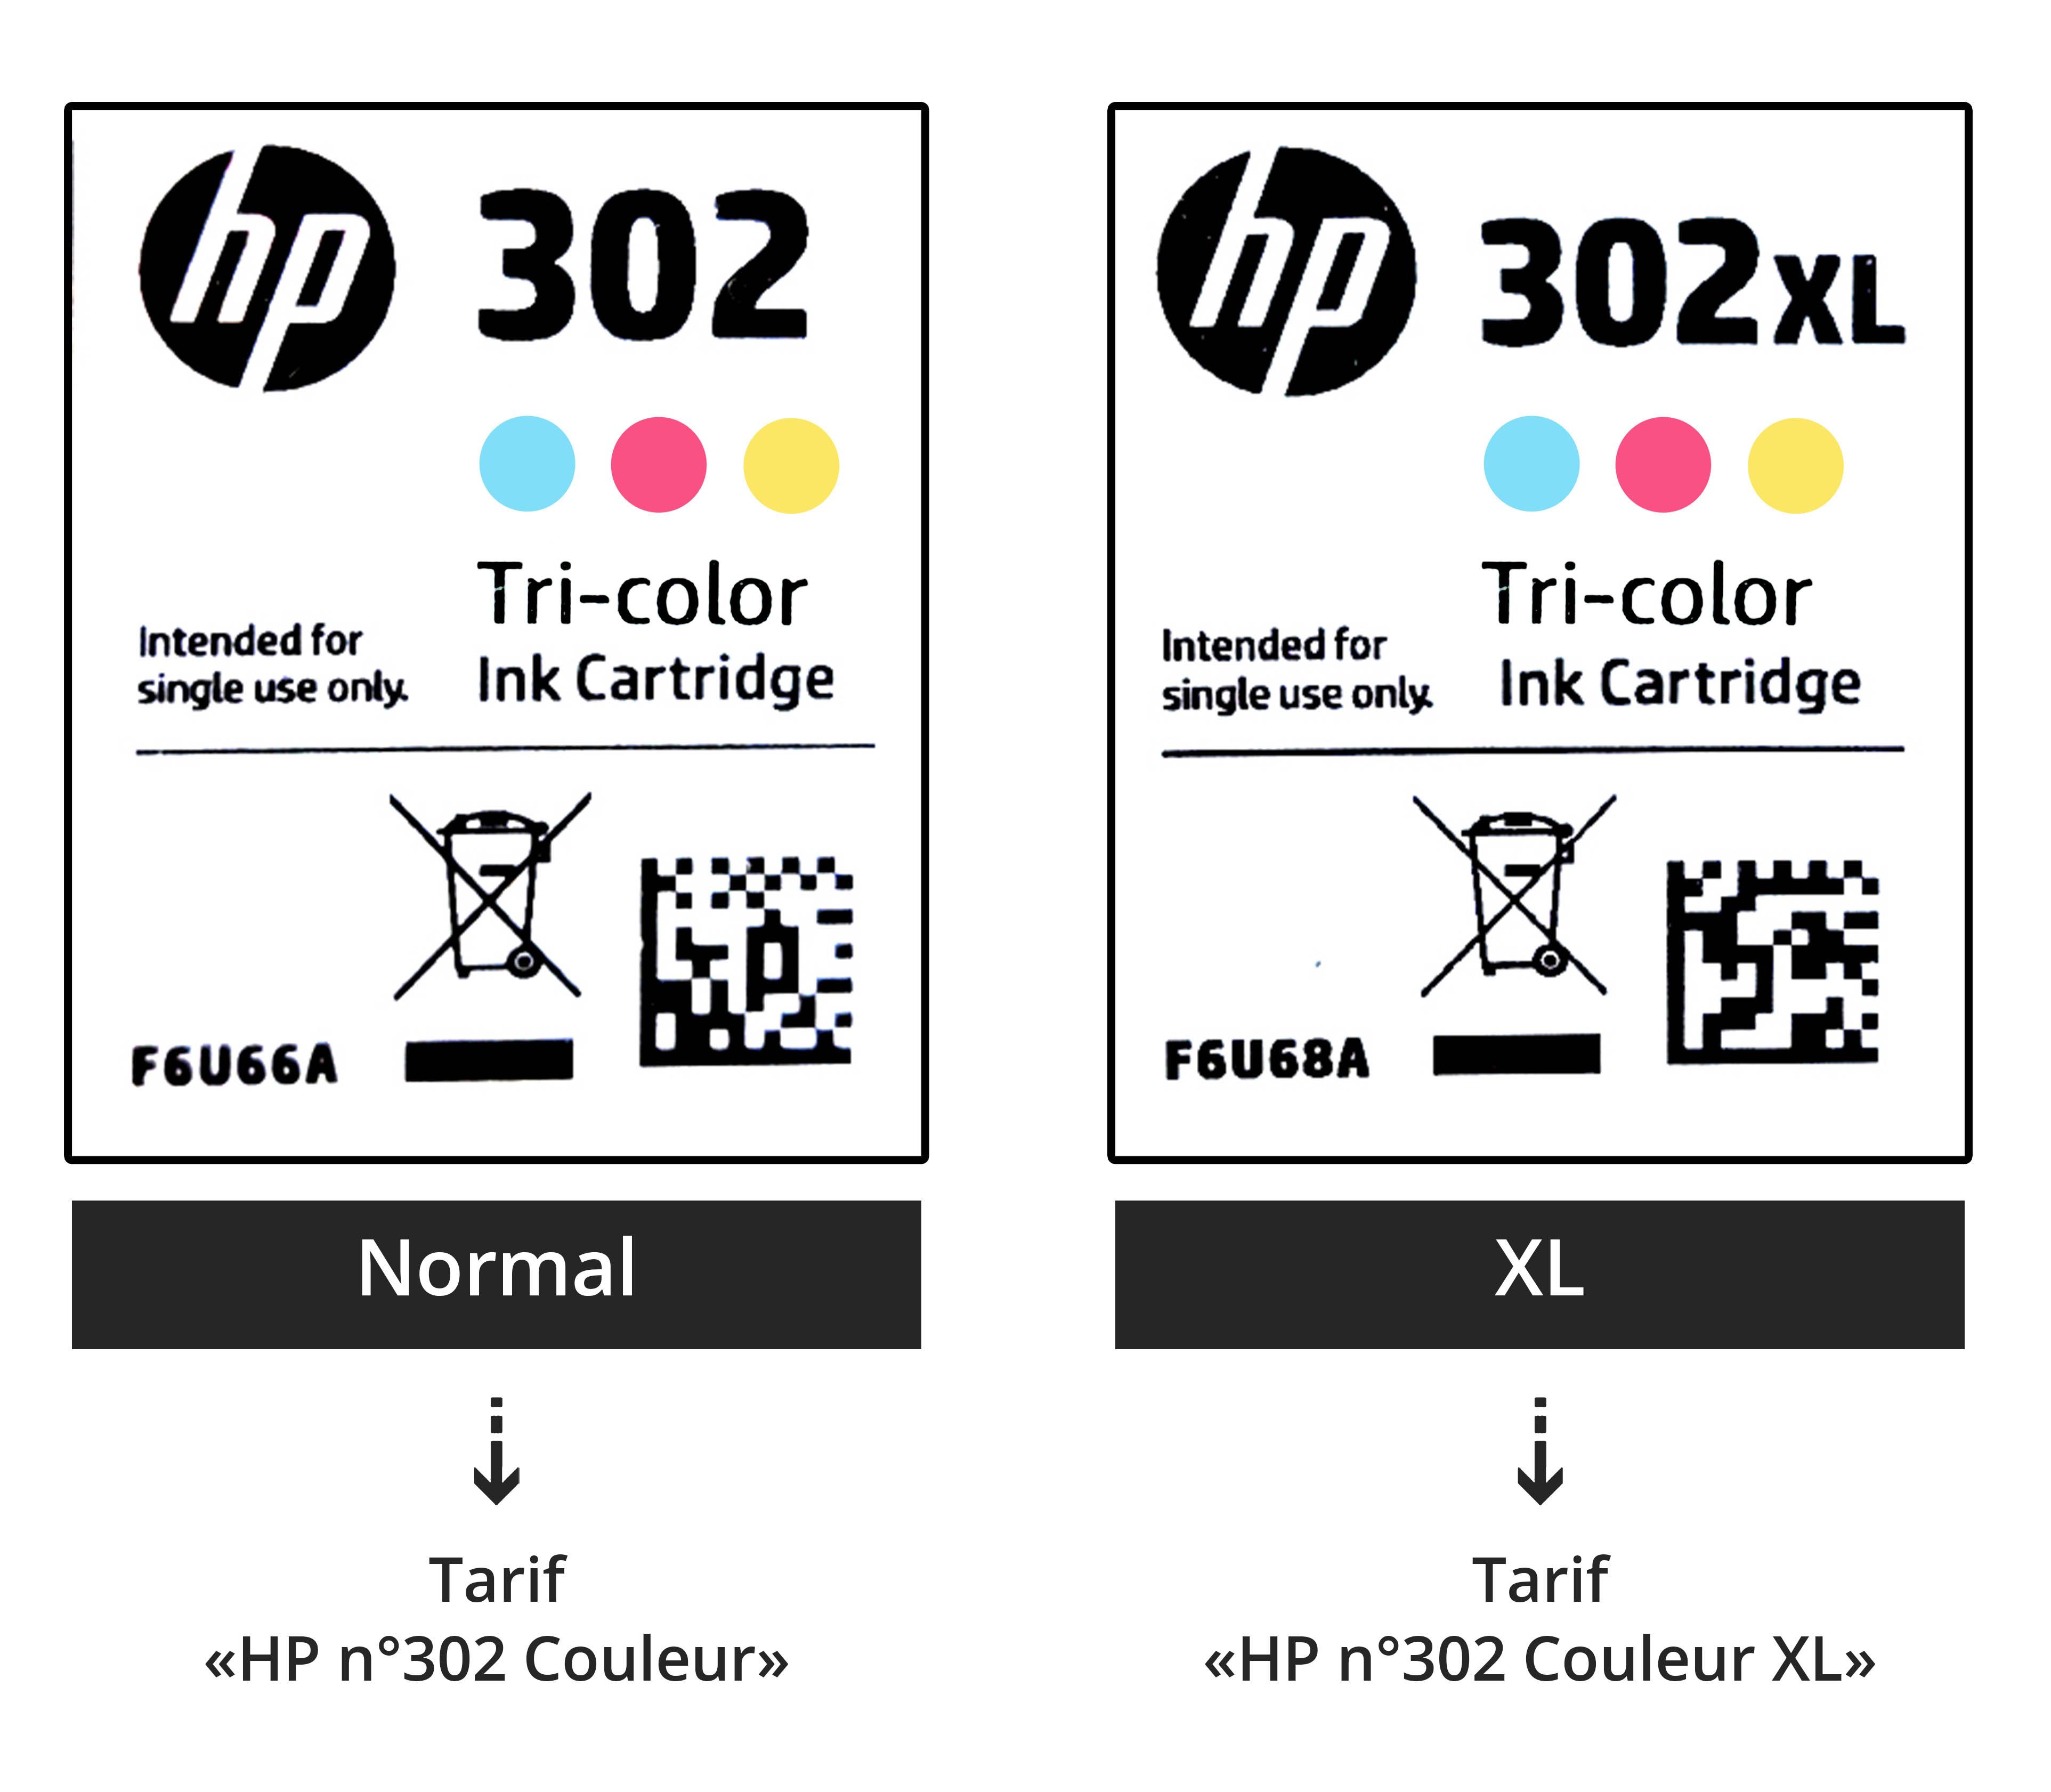 montage-etiquettes-normal-HP-302_2.jpg